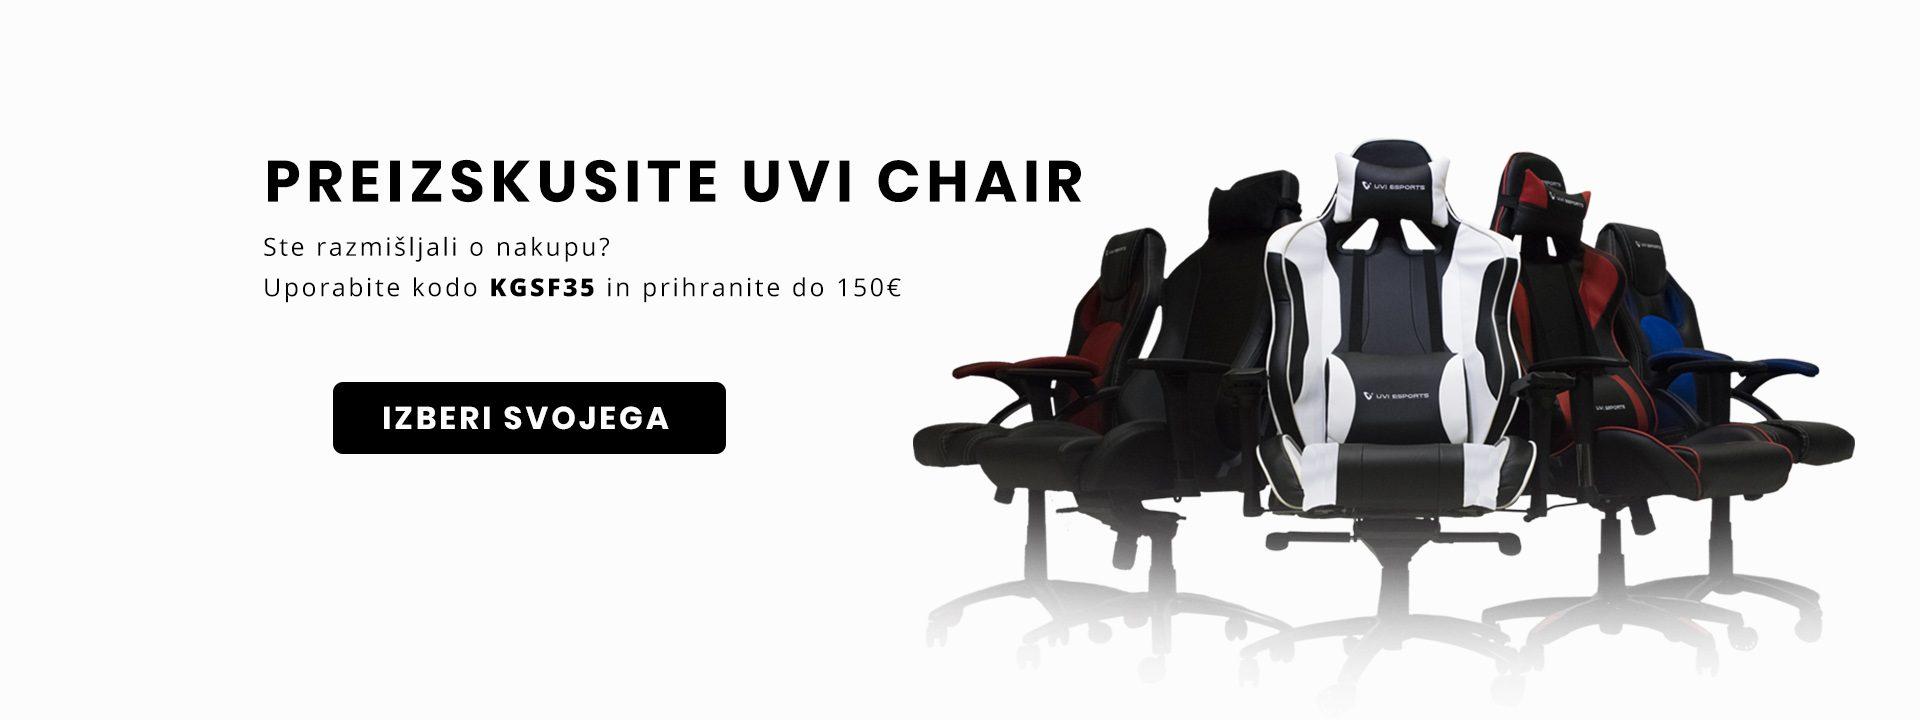 Testiraj UVI Chair na StarFallu